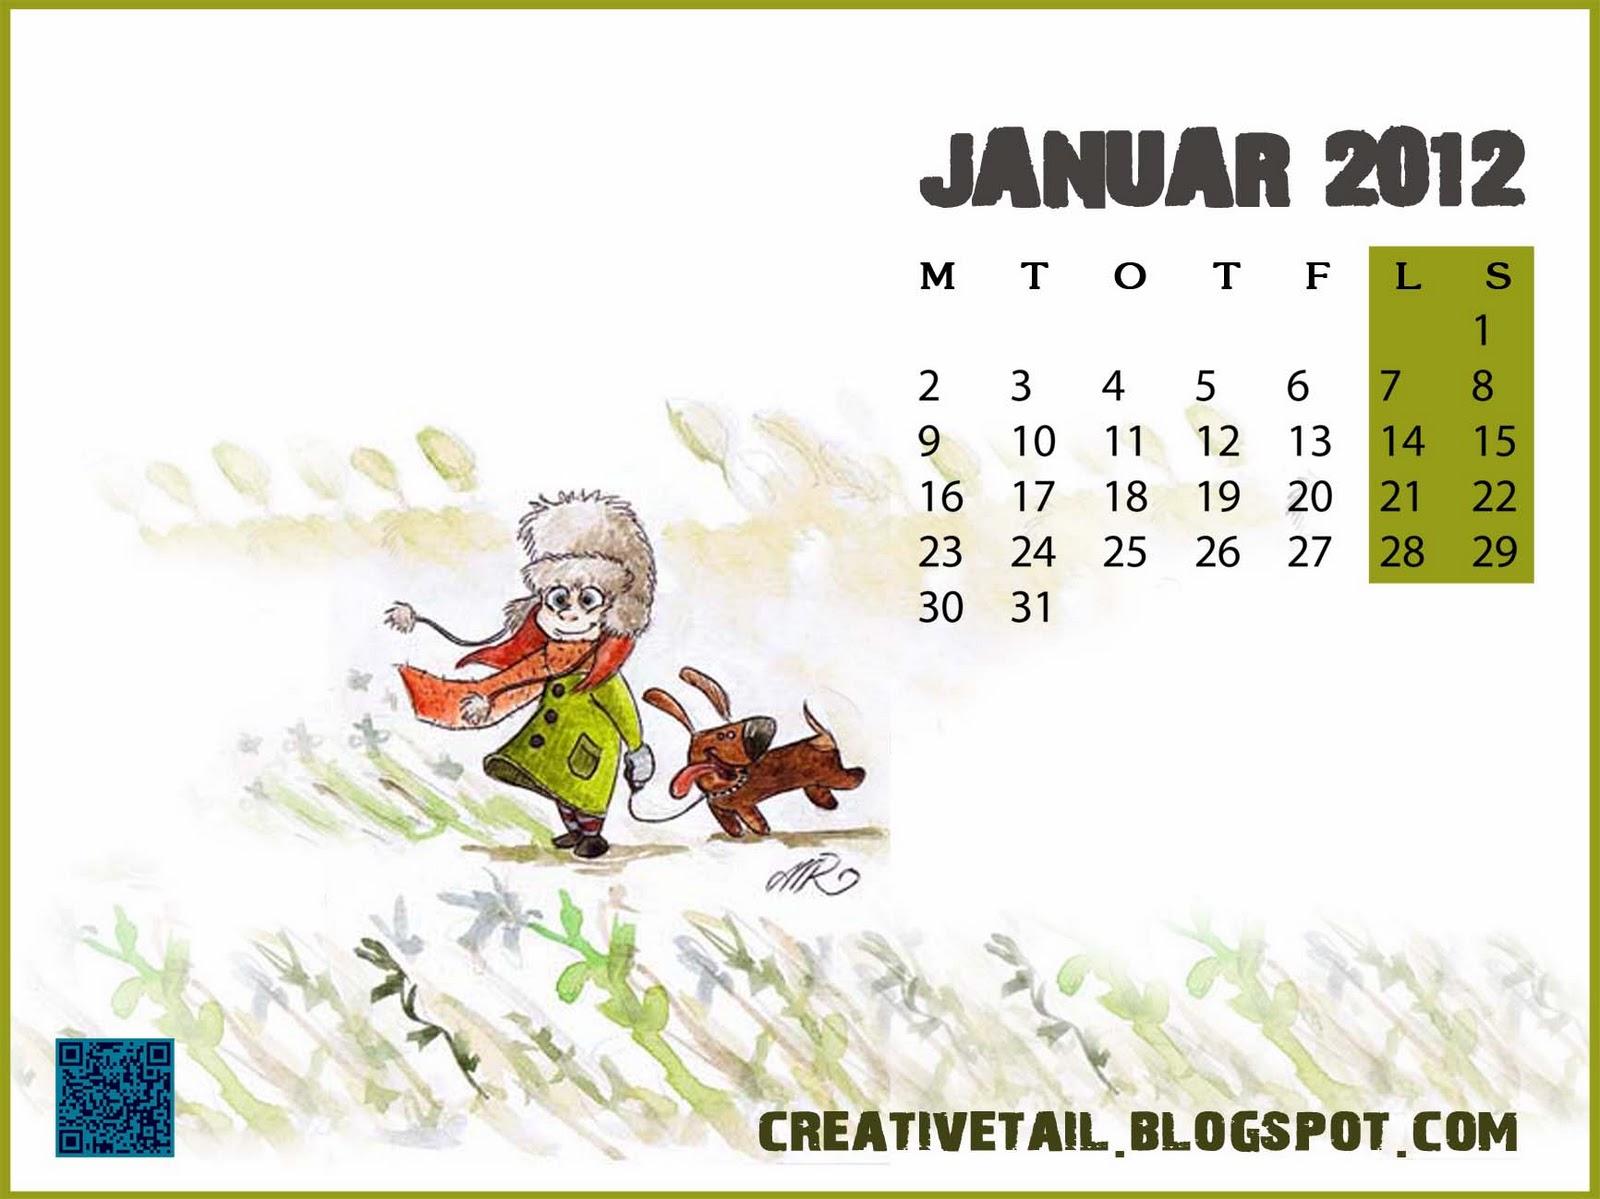 http://1.bp.blogspot.com/-917KM06Jres/Twl3wsb9UII/AAAAAAAADR0/JdjUNdbpDoc/s1600/Kalender_2012_januar.jpg